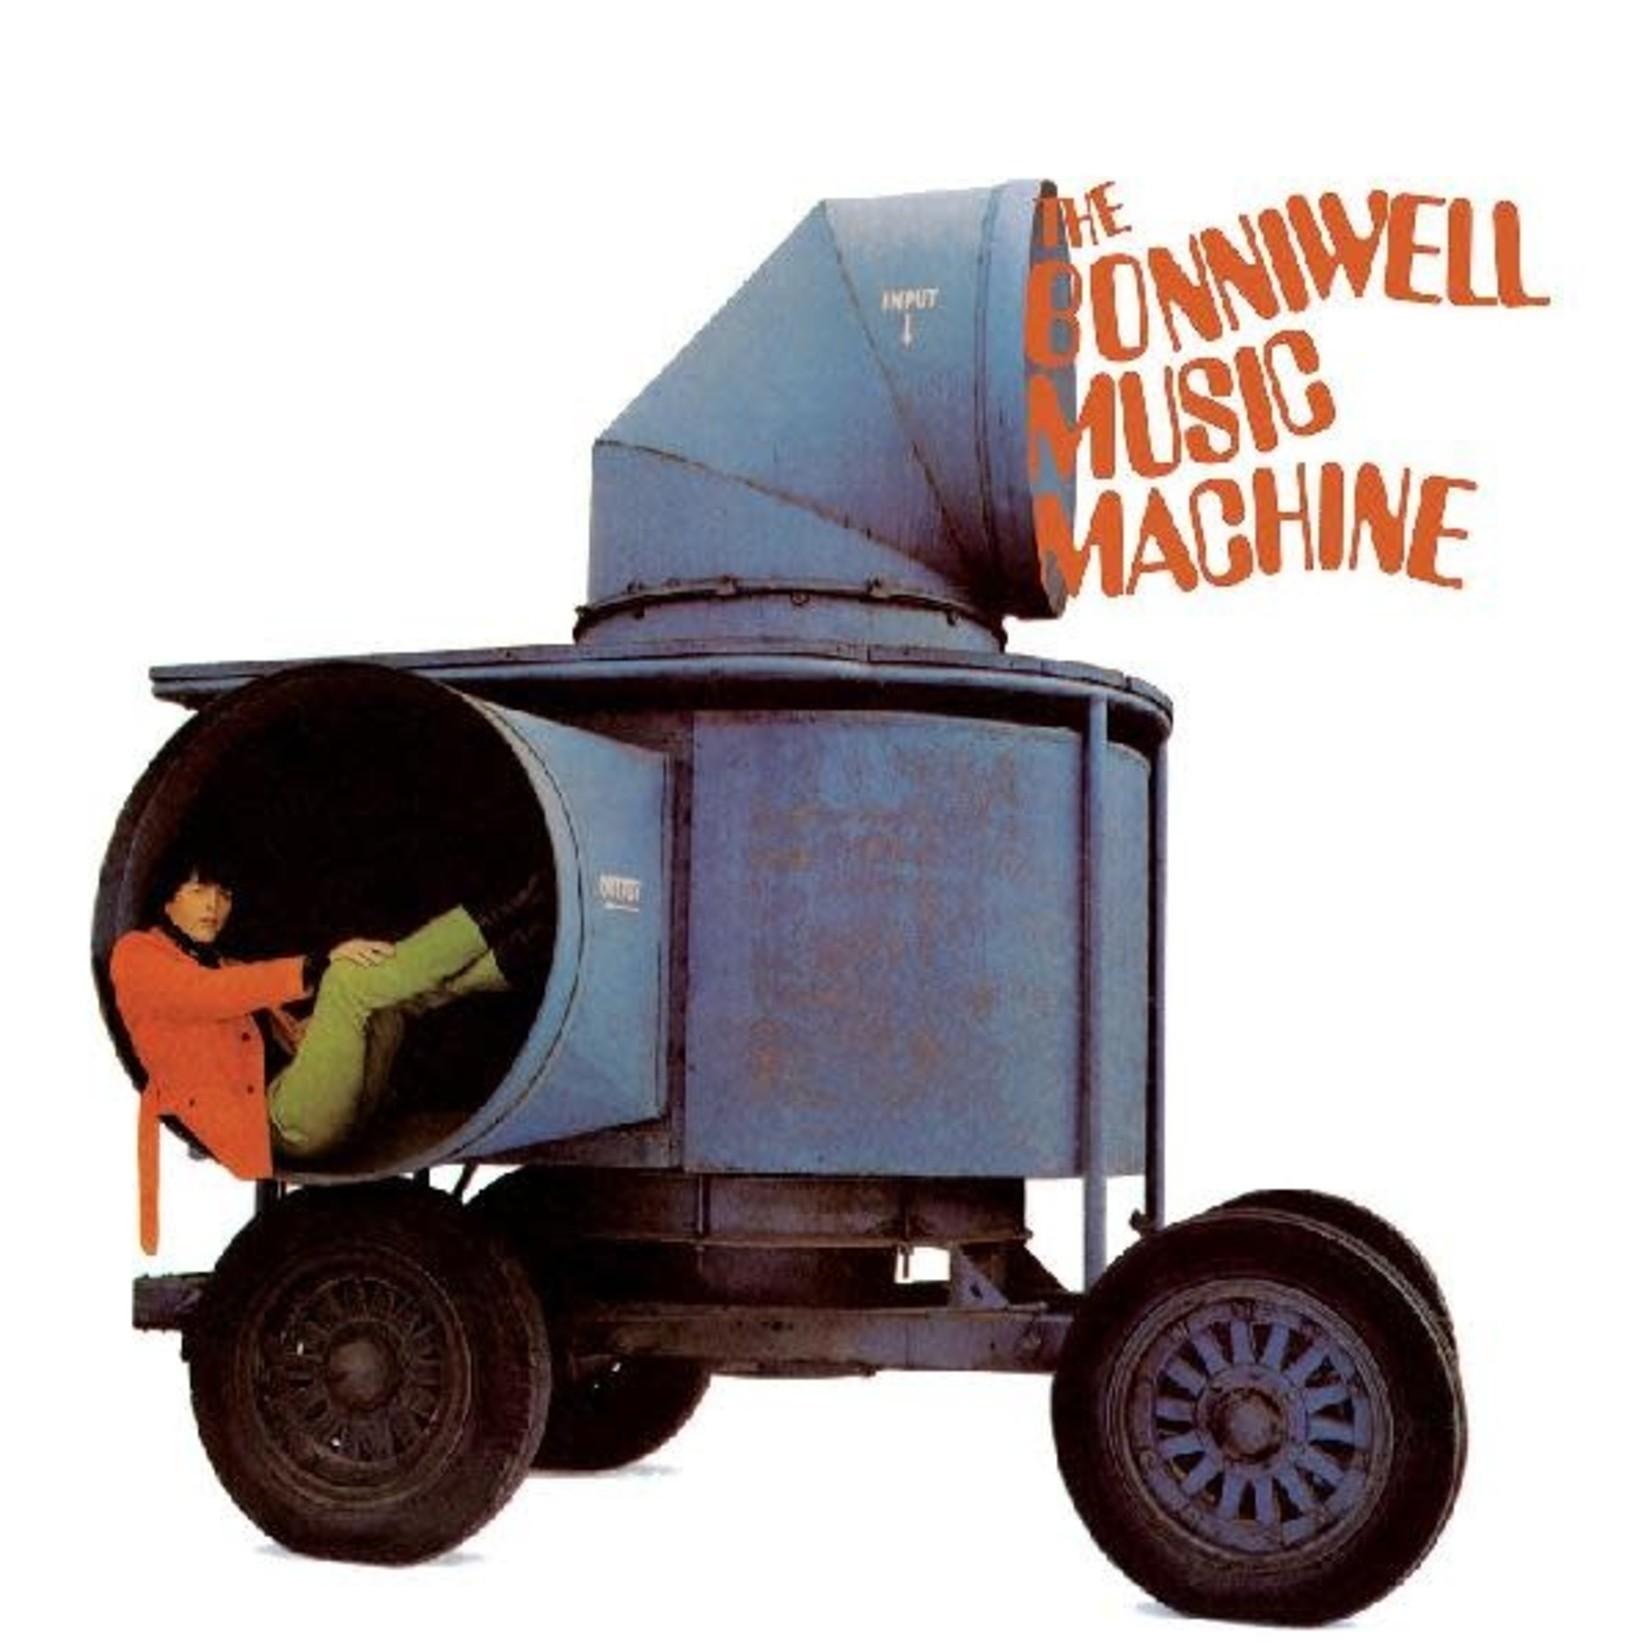 Vinyl The Bonniwell Music Machine - S/T